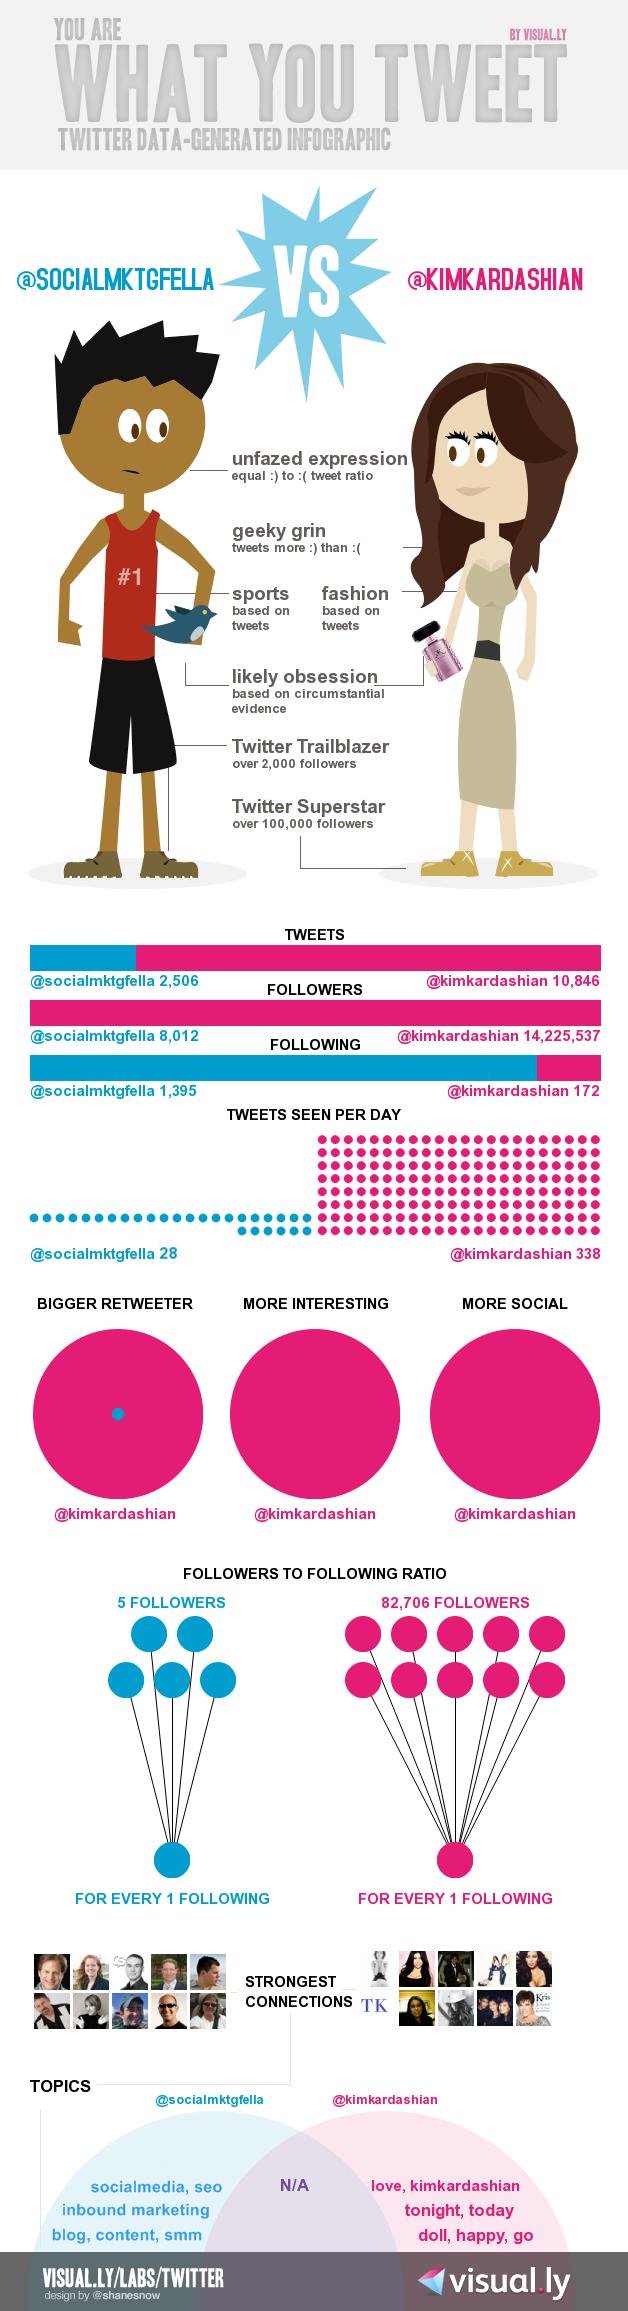 Infographic socialmarketingfella kim